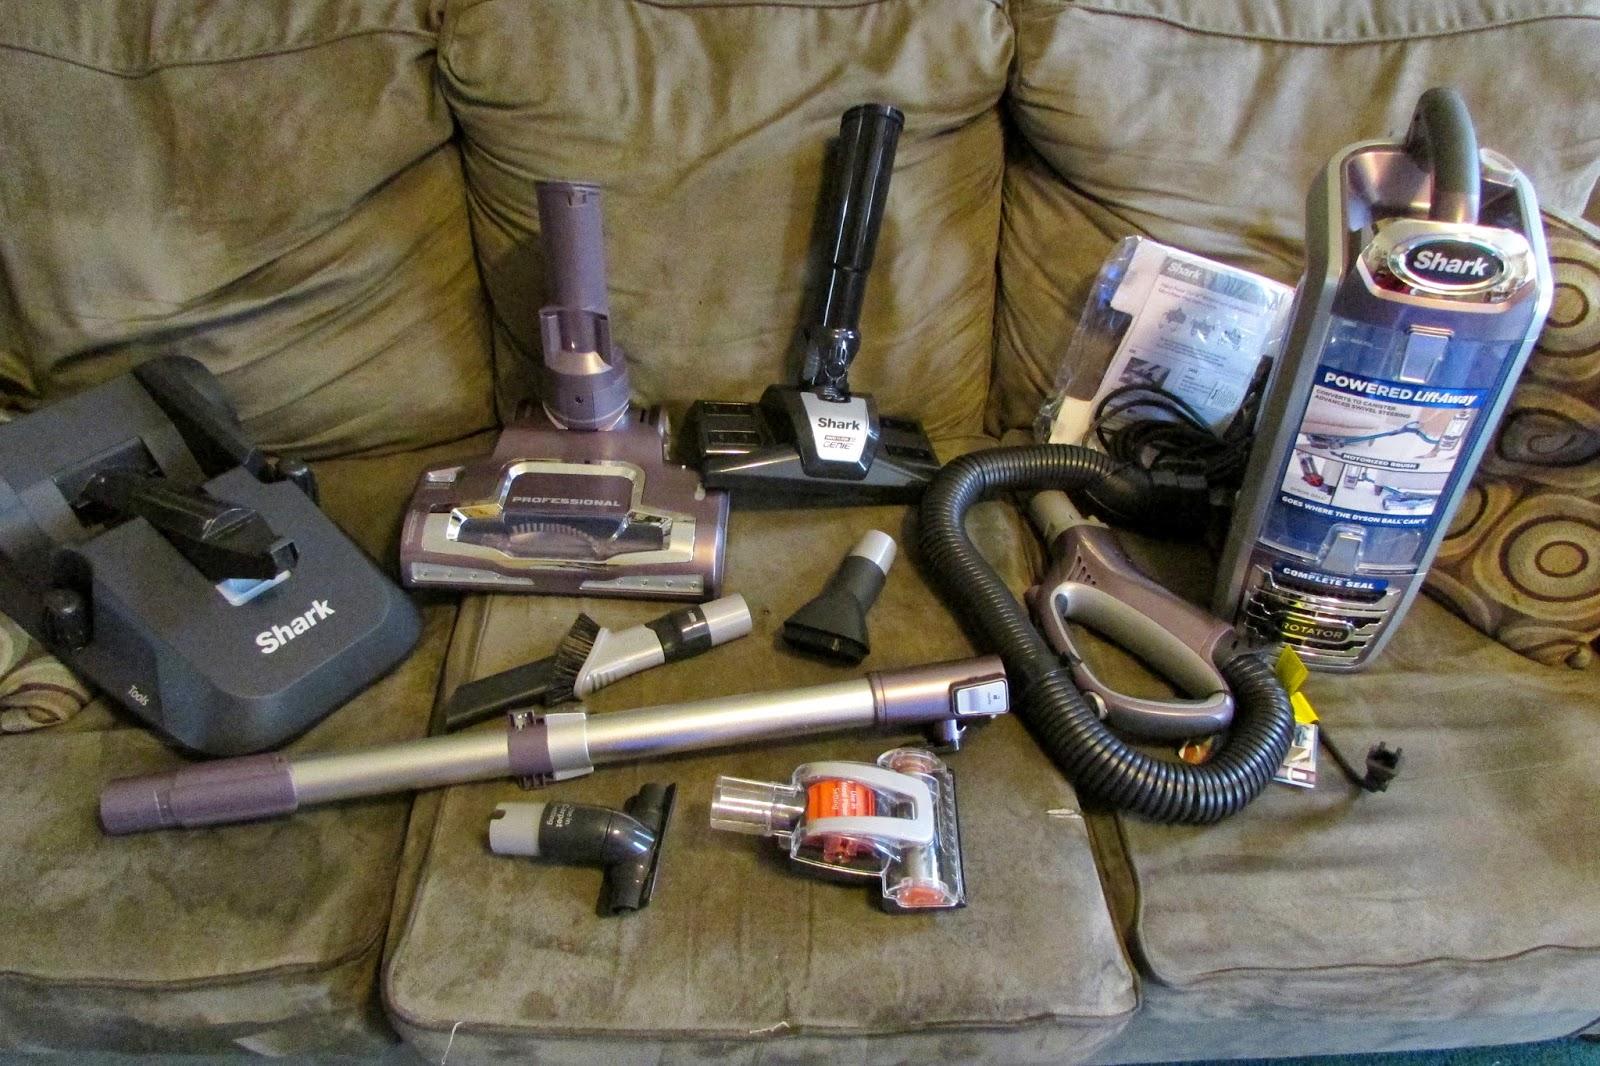 Heck Of A Bunch Shark Rotator Powered Lift Away Vacuum